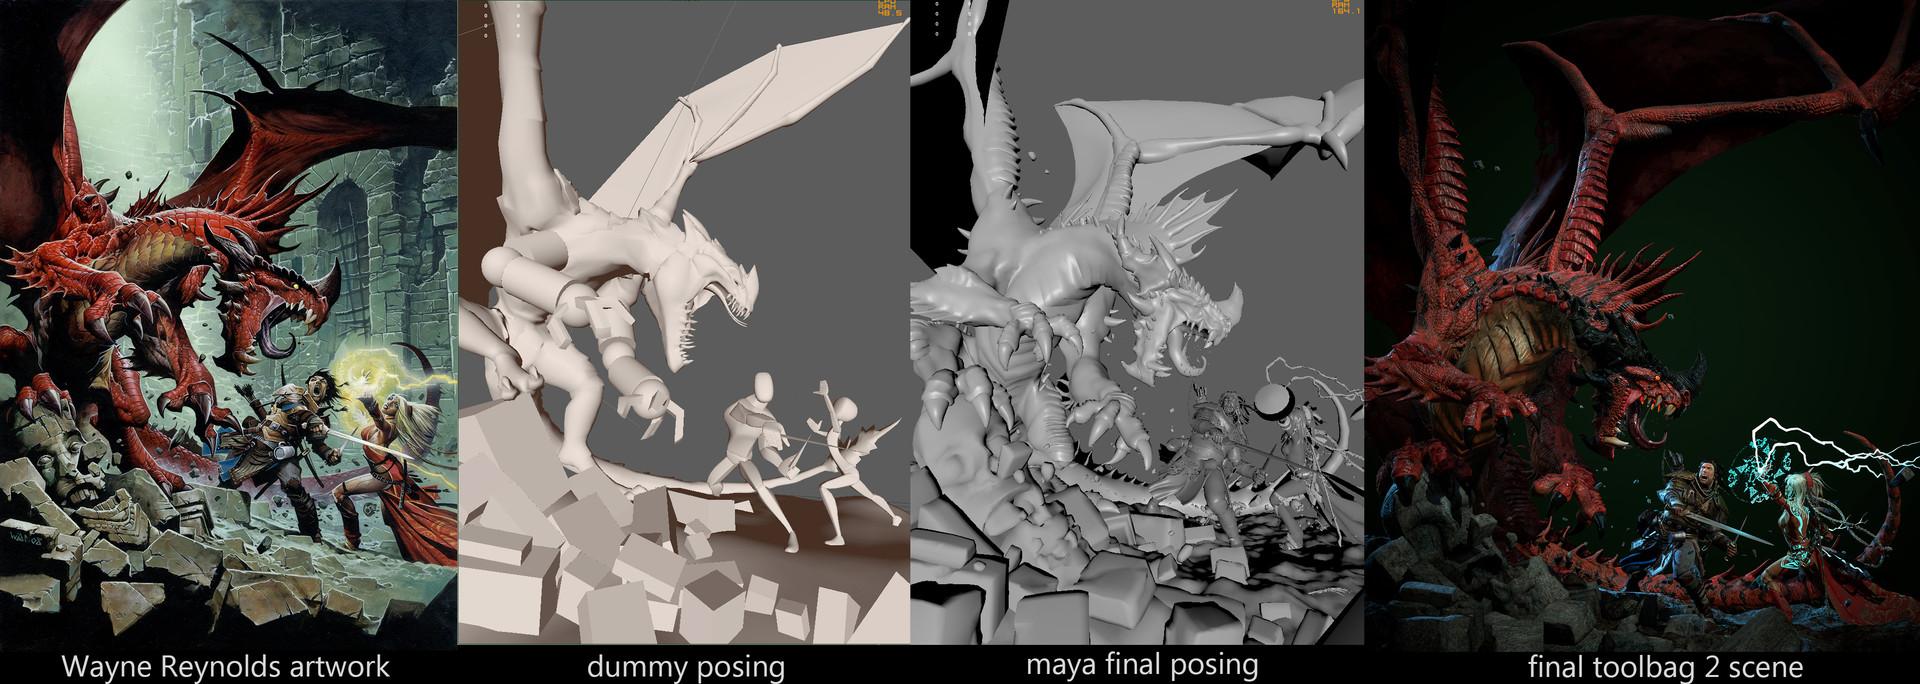 Rafael malavassi posing process